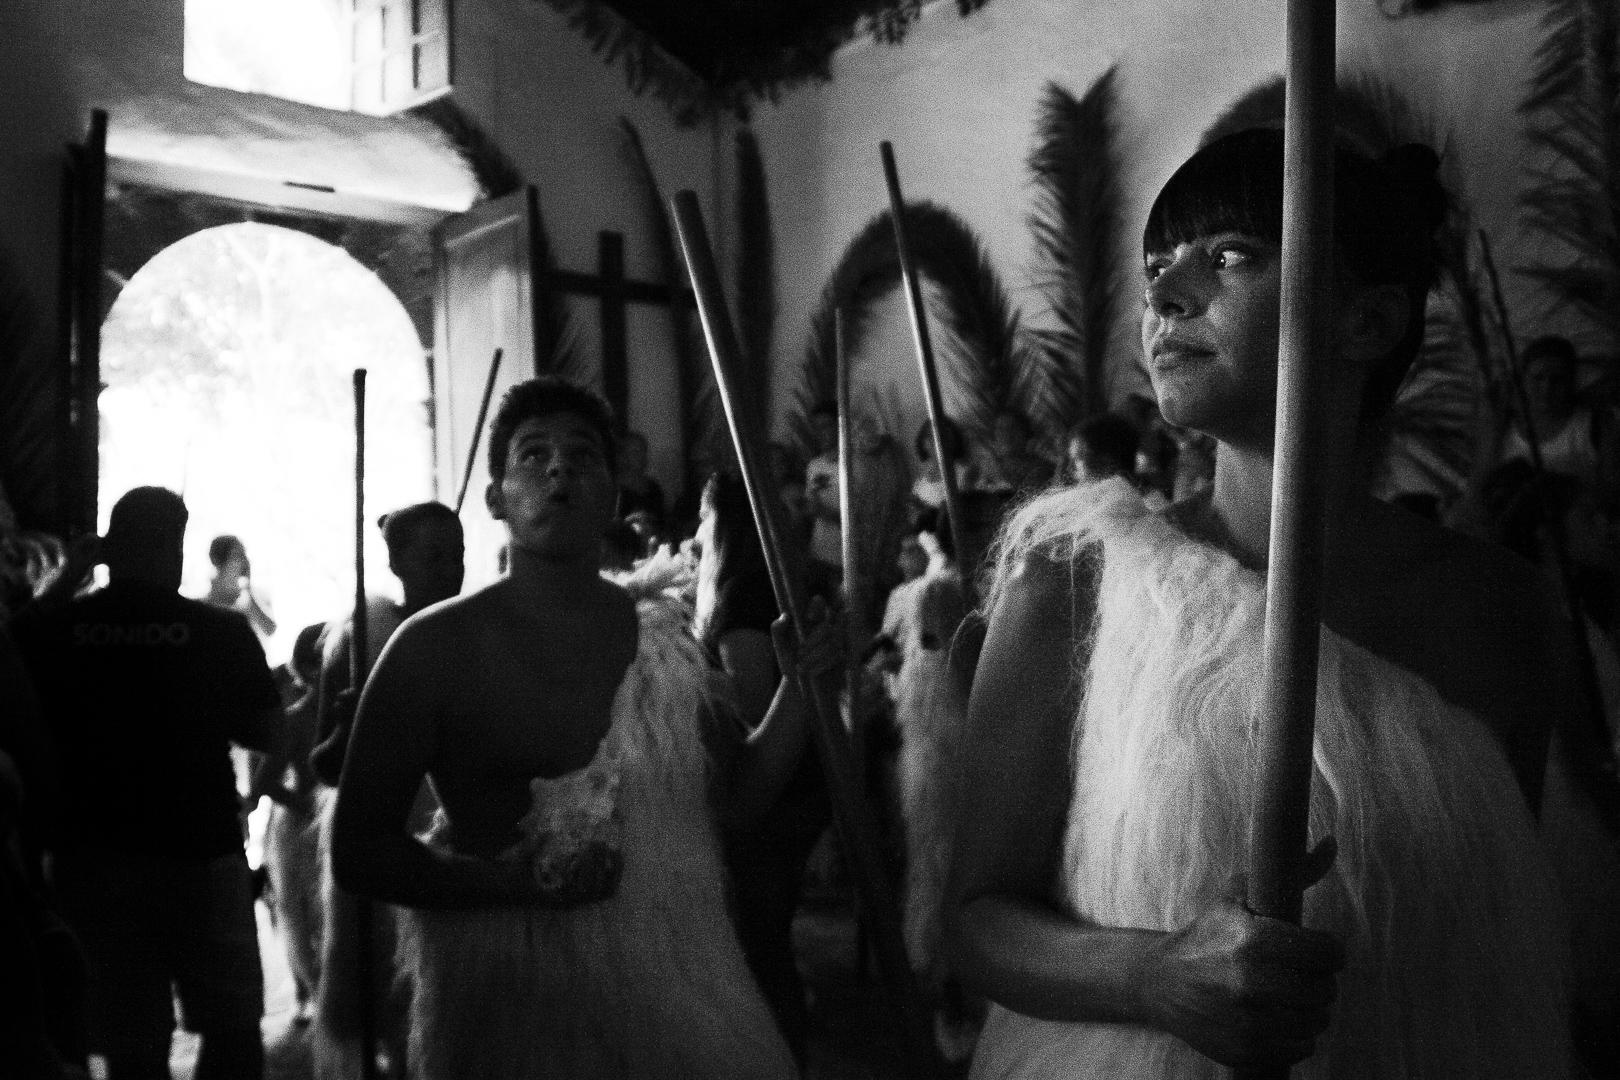 Romeria, Guimar - Socorro; Guanches entering the chapel / ermita